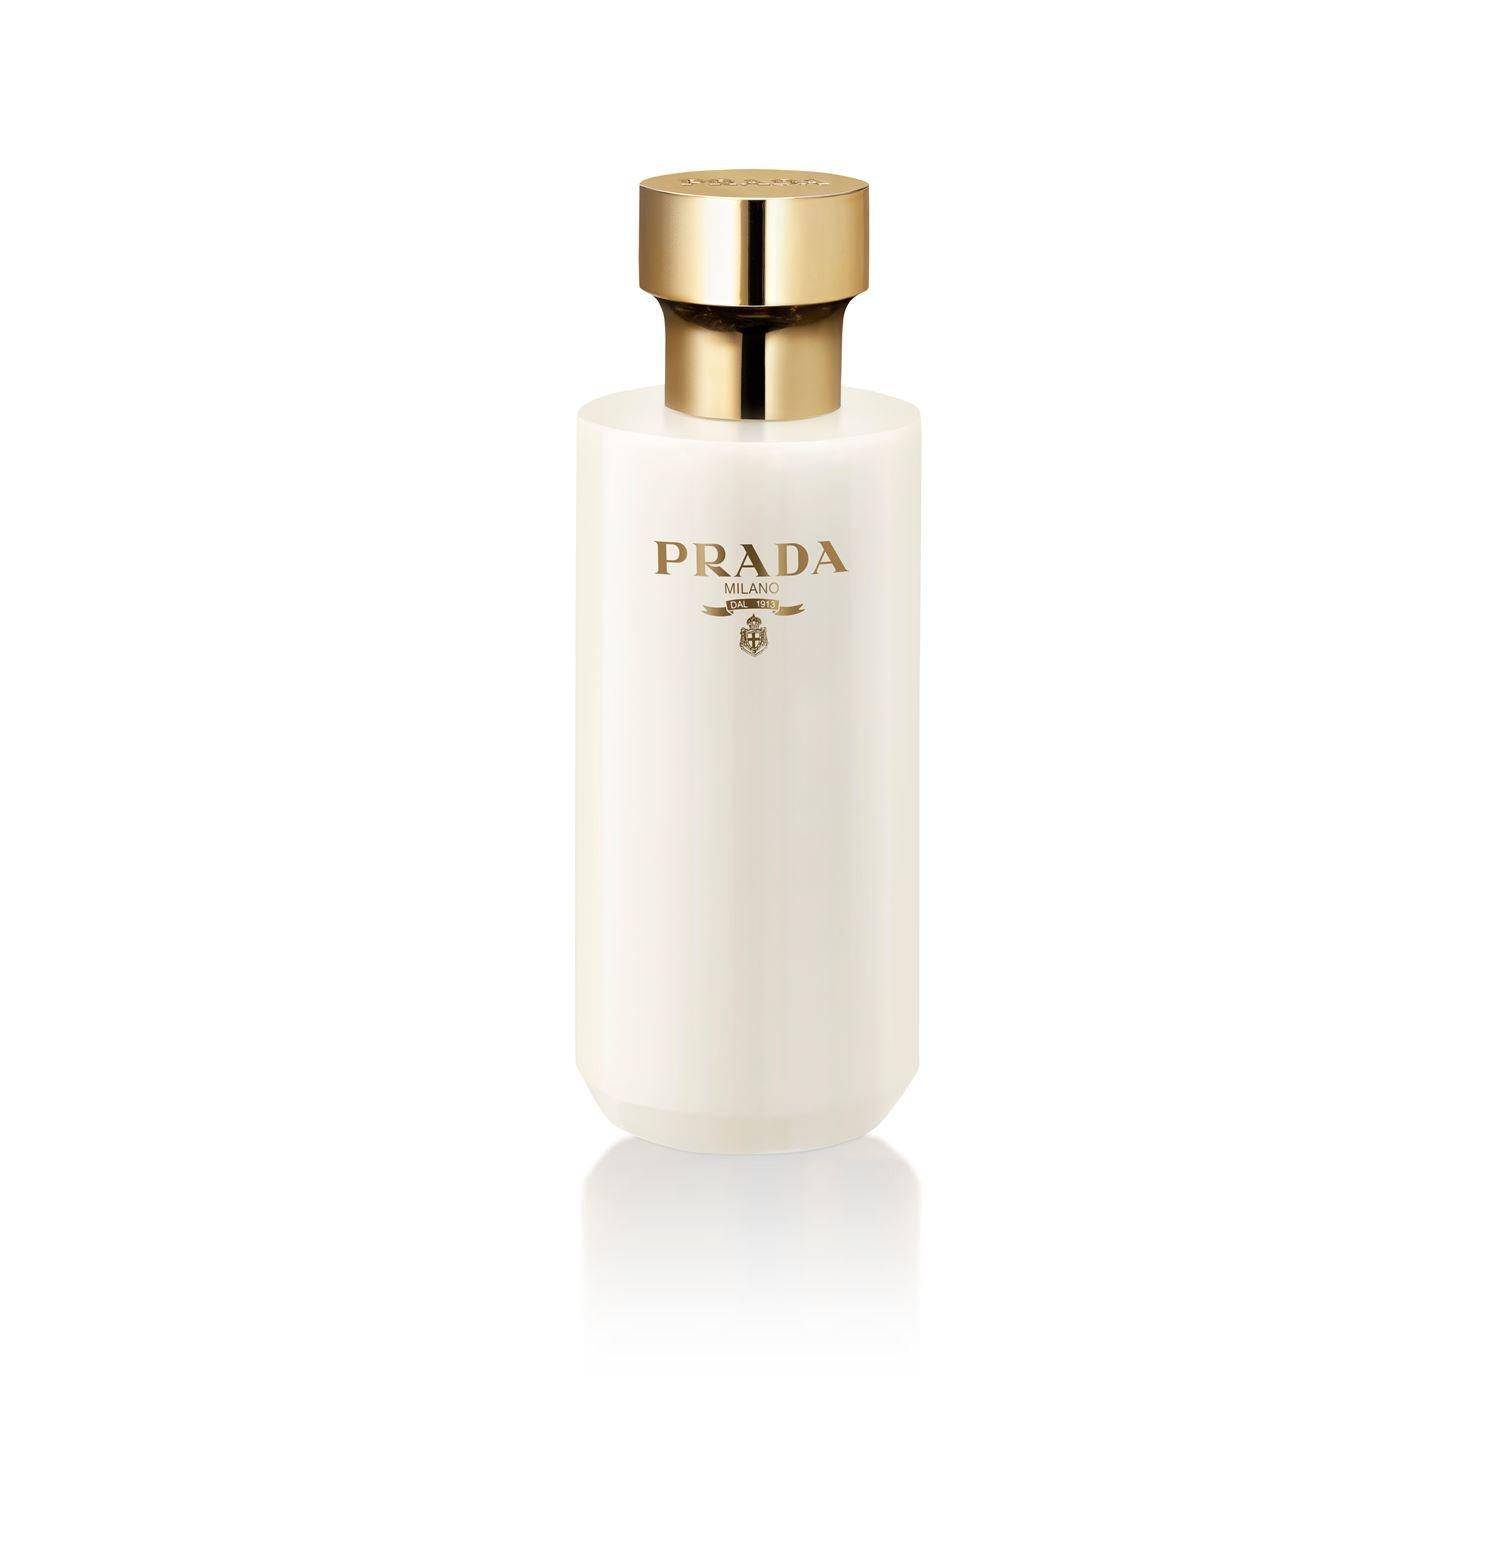 Prada - La Femme Body Lotion